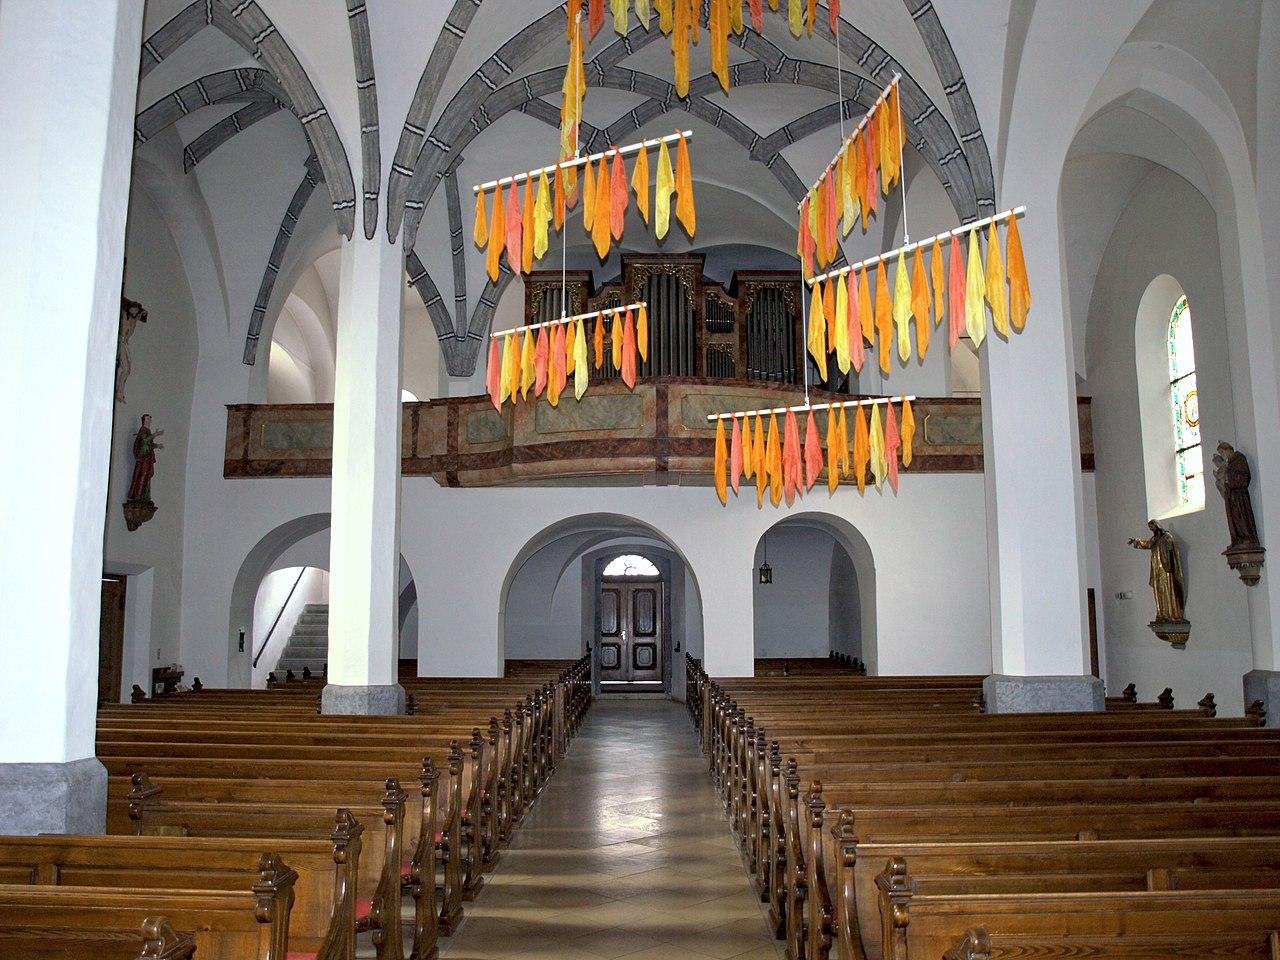 1280px-2012.05.03_-_Euratsfeld_-_Pfarrkirche_hl._Johannes_-_09.jpg